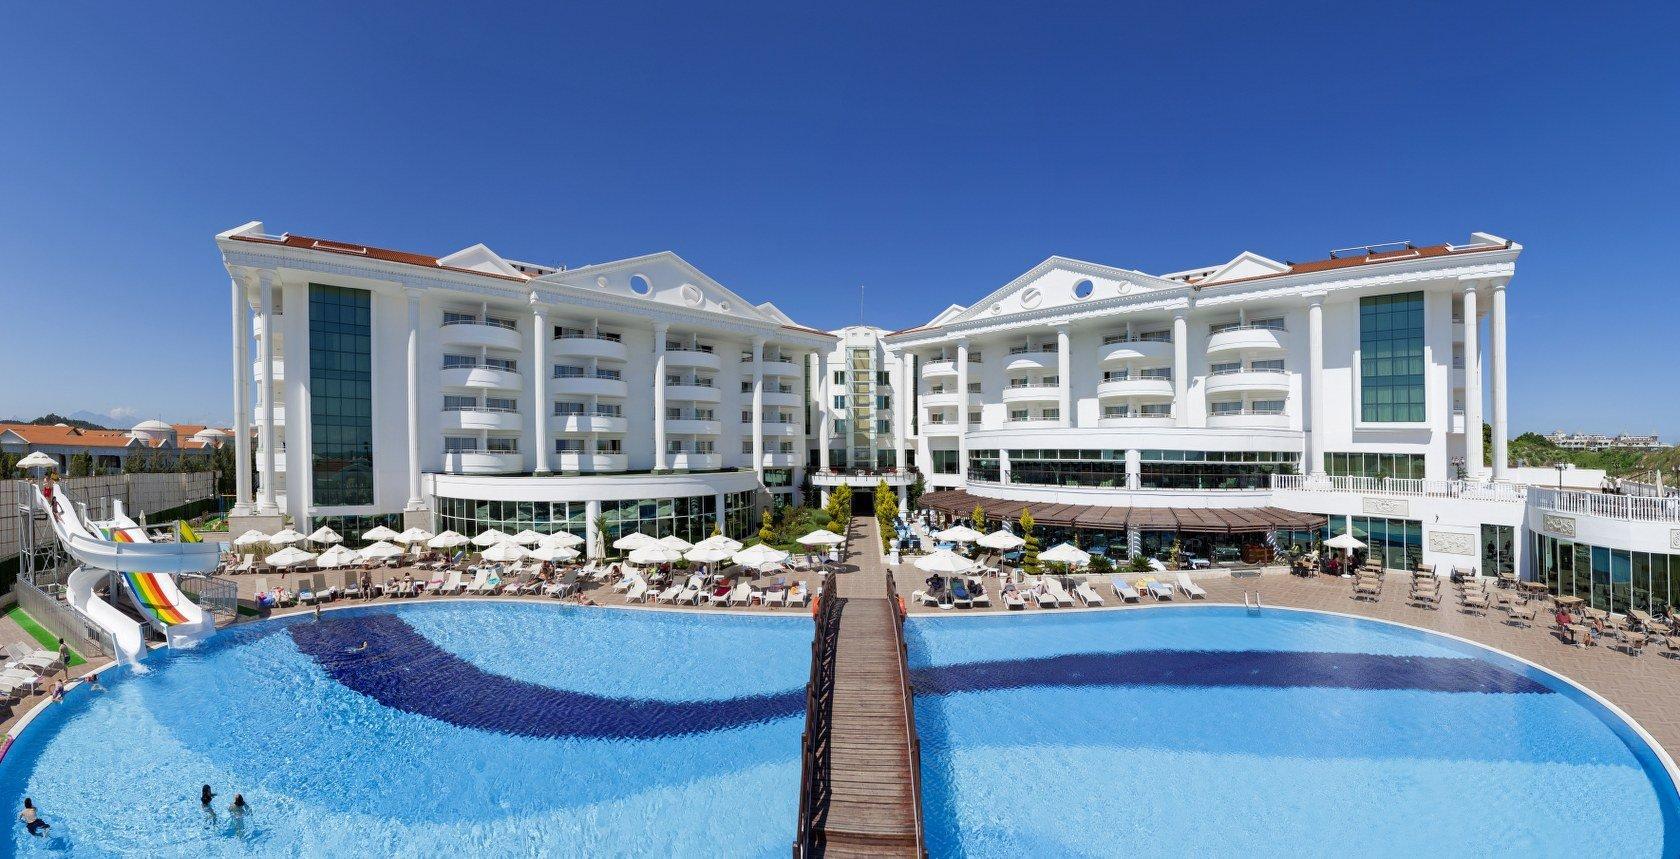 Beach Hotel - room photo 3057143